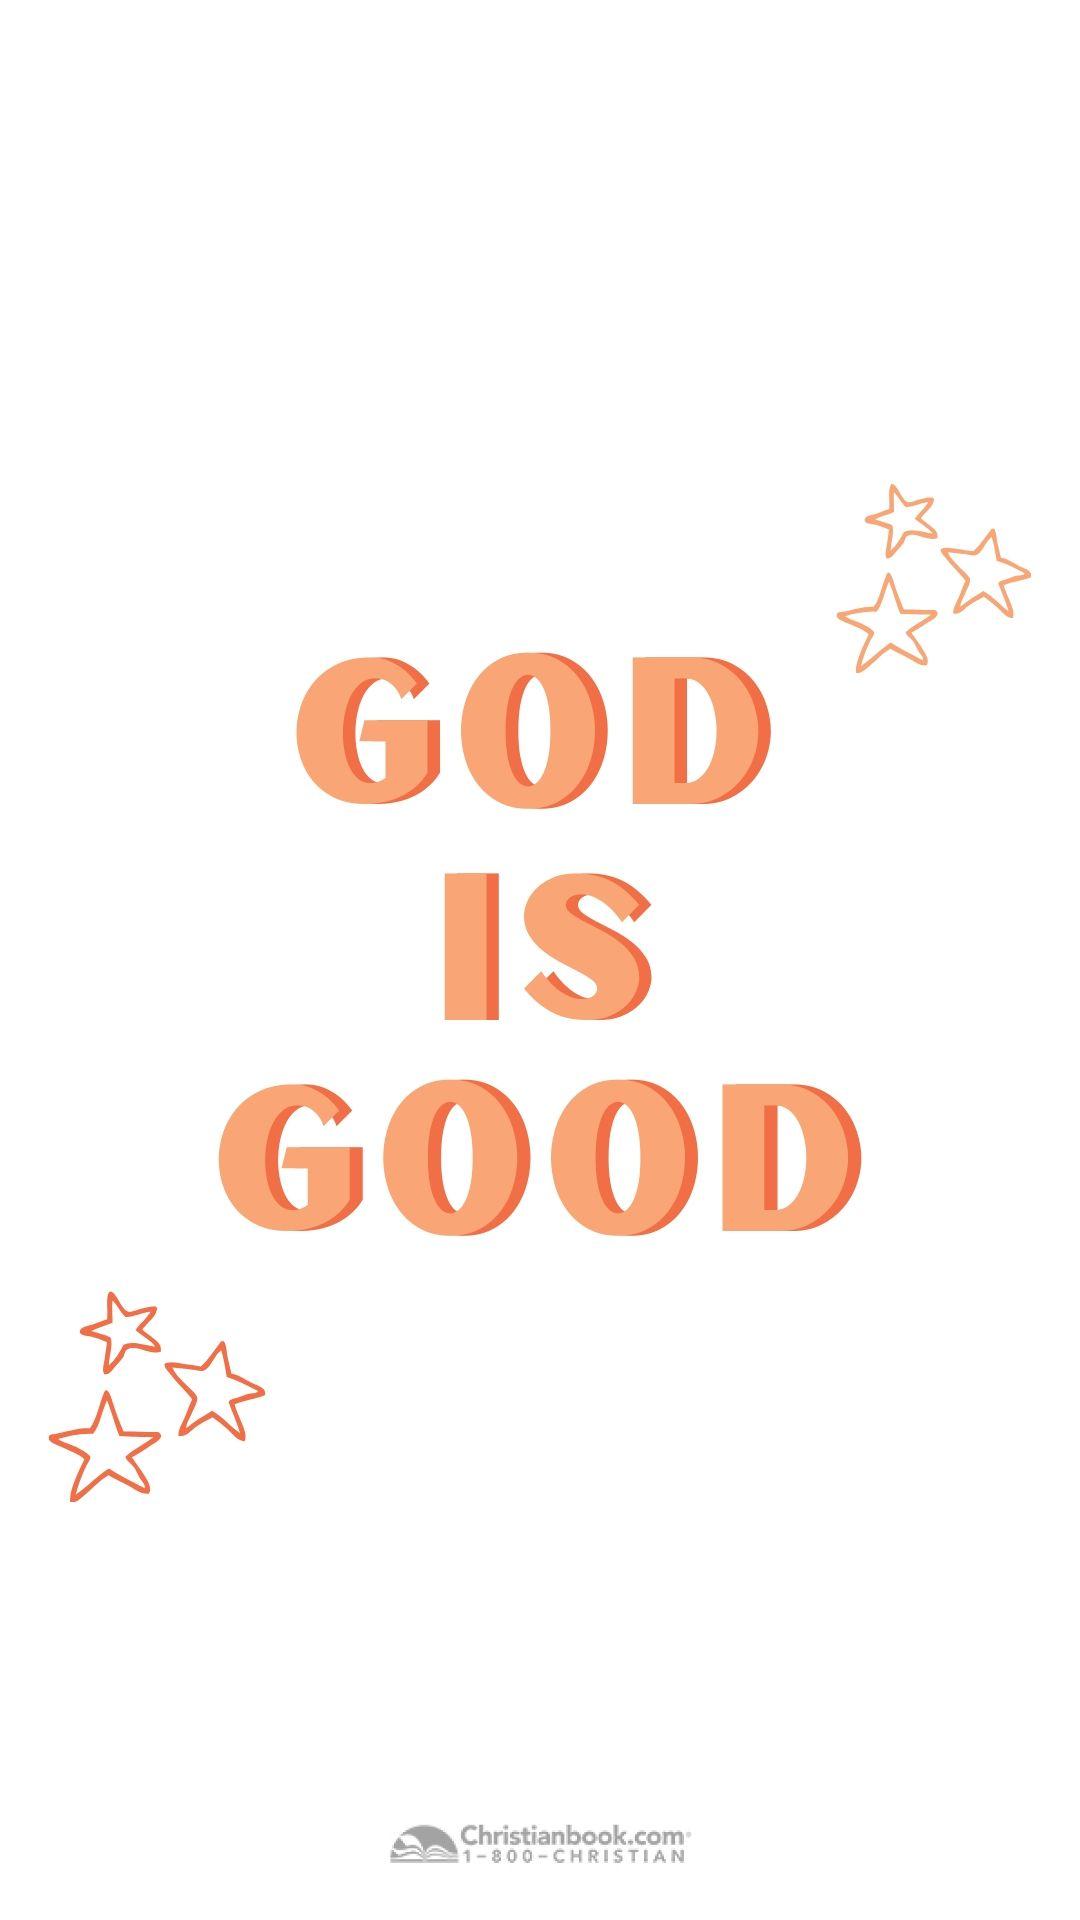 DOWNLOAD // Free Christian Wallpaper - Christianbook.com Blog